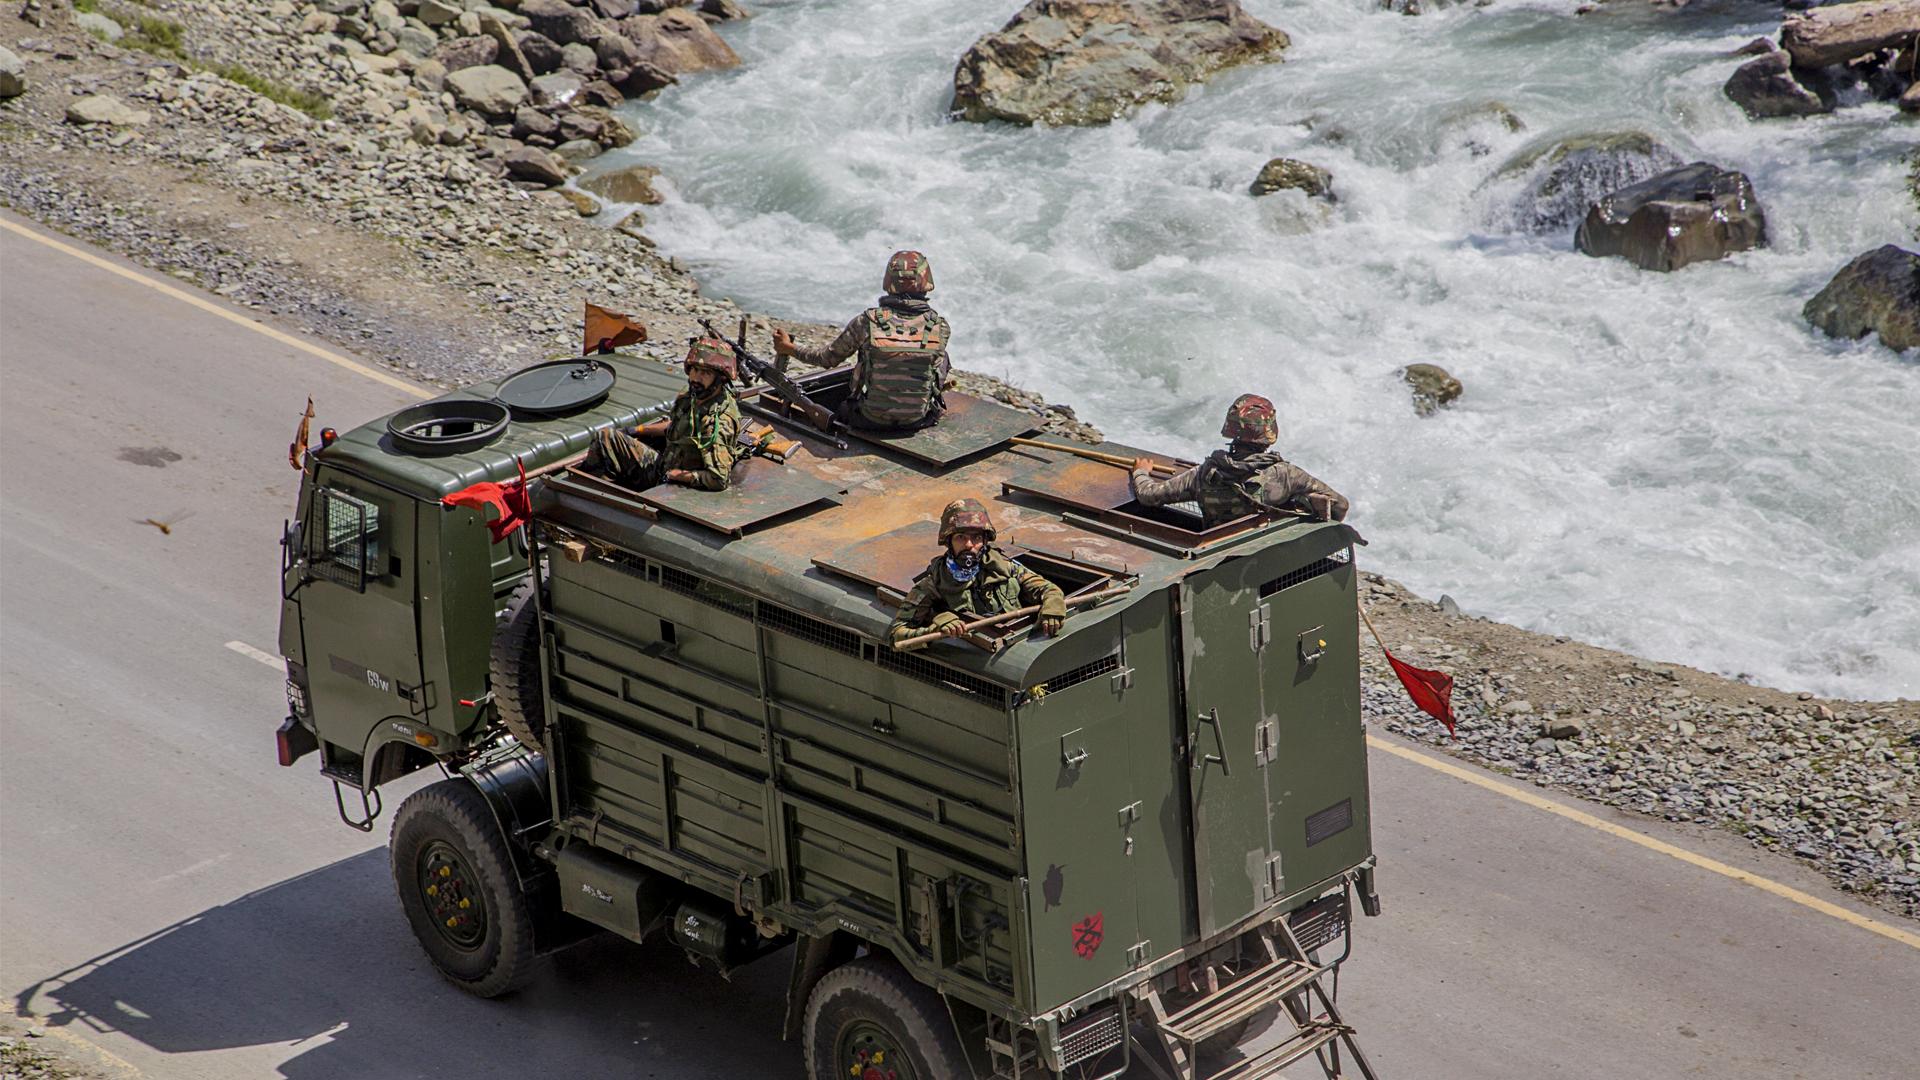 Indian, Chinese Troops Begin Disengaging At Pangong Lake